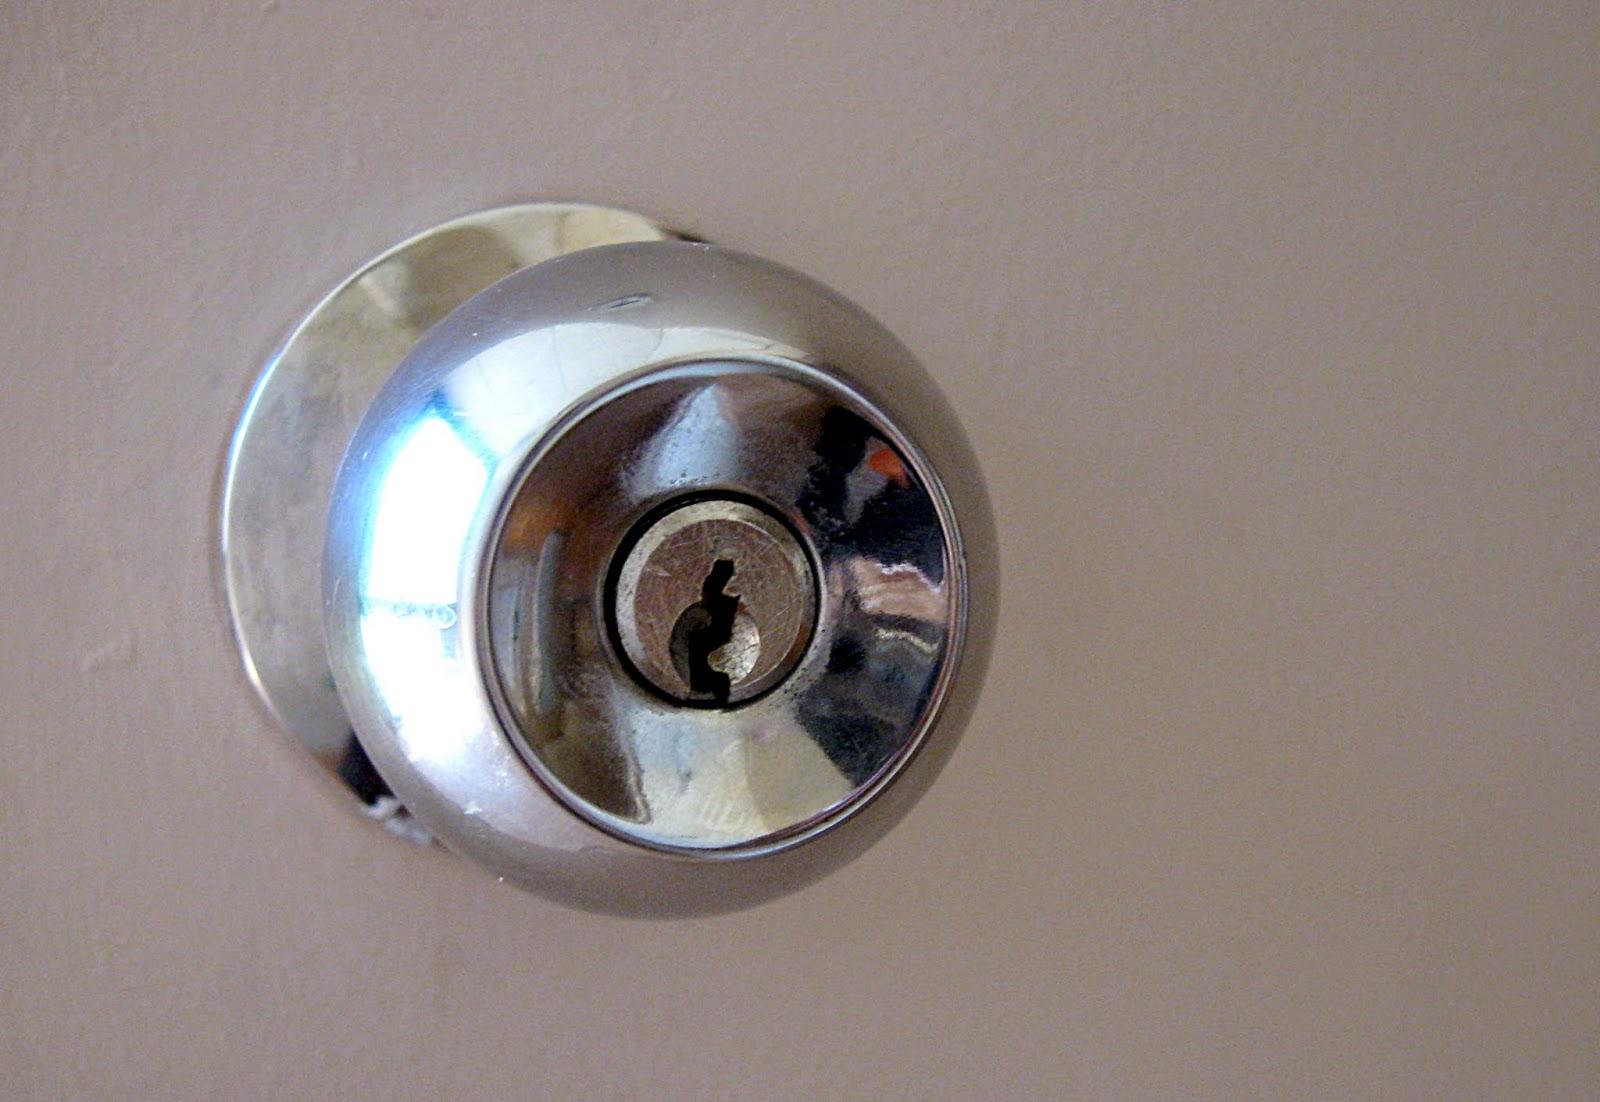 http://www.locksmithbushwickbrooklyn.info/#!residential/c9if